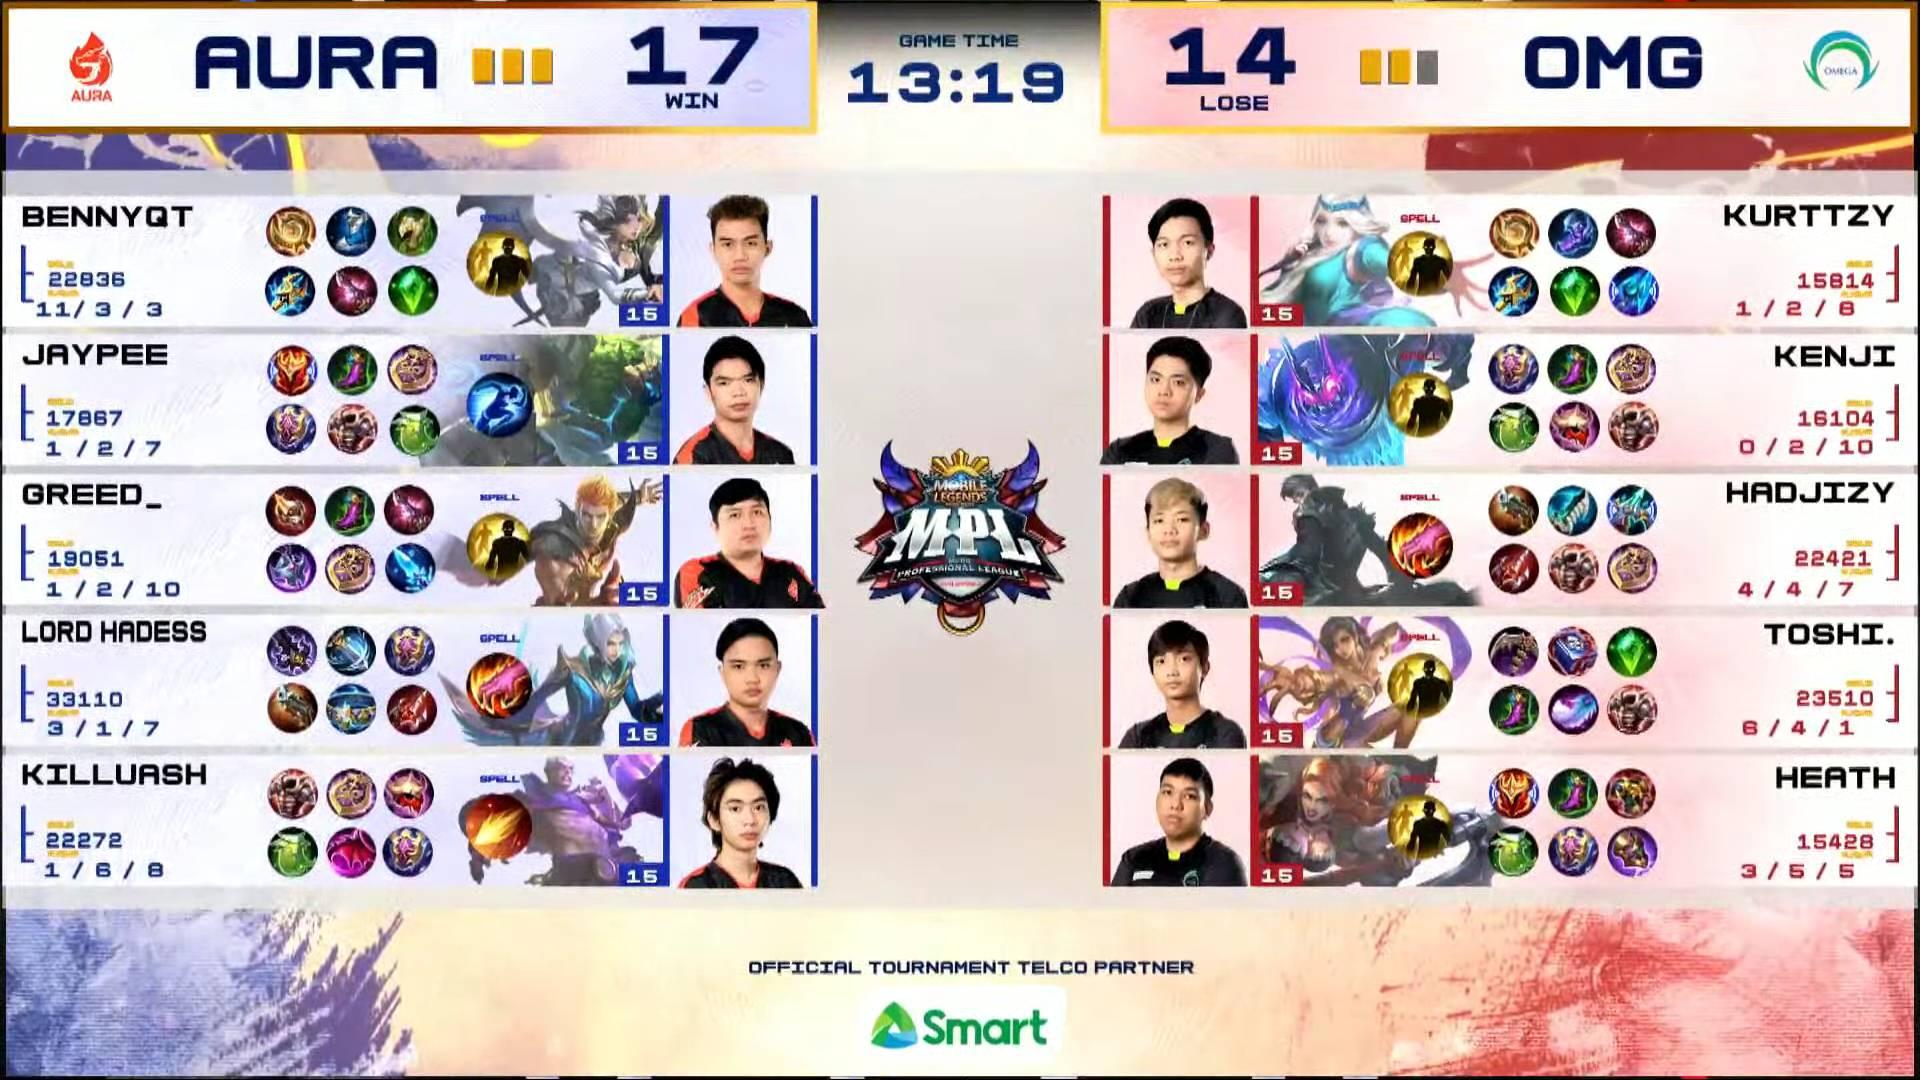 MPL-PH-Season-7-Lower-brack-Aura-def-Omega-Game-5 Bennyqt's Lunox rises as Aura PH outlasts Omega in marathon MPL playoffs match ESports Mobile Legends MPL-PH News  - philippine sports news